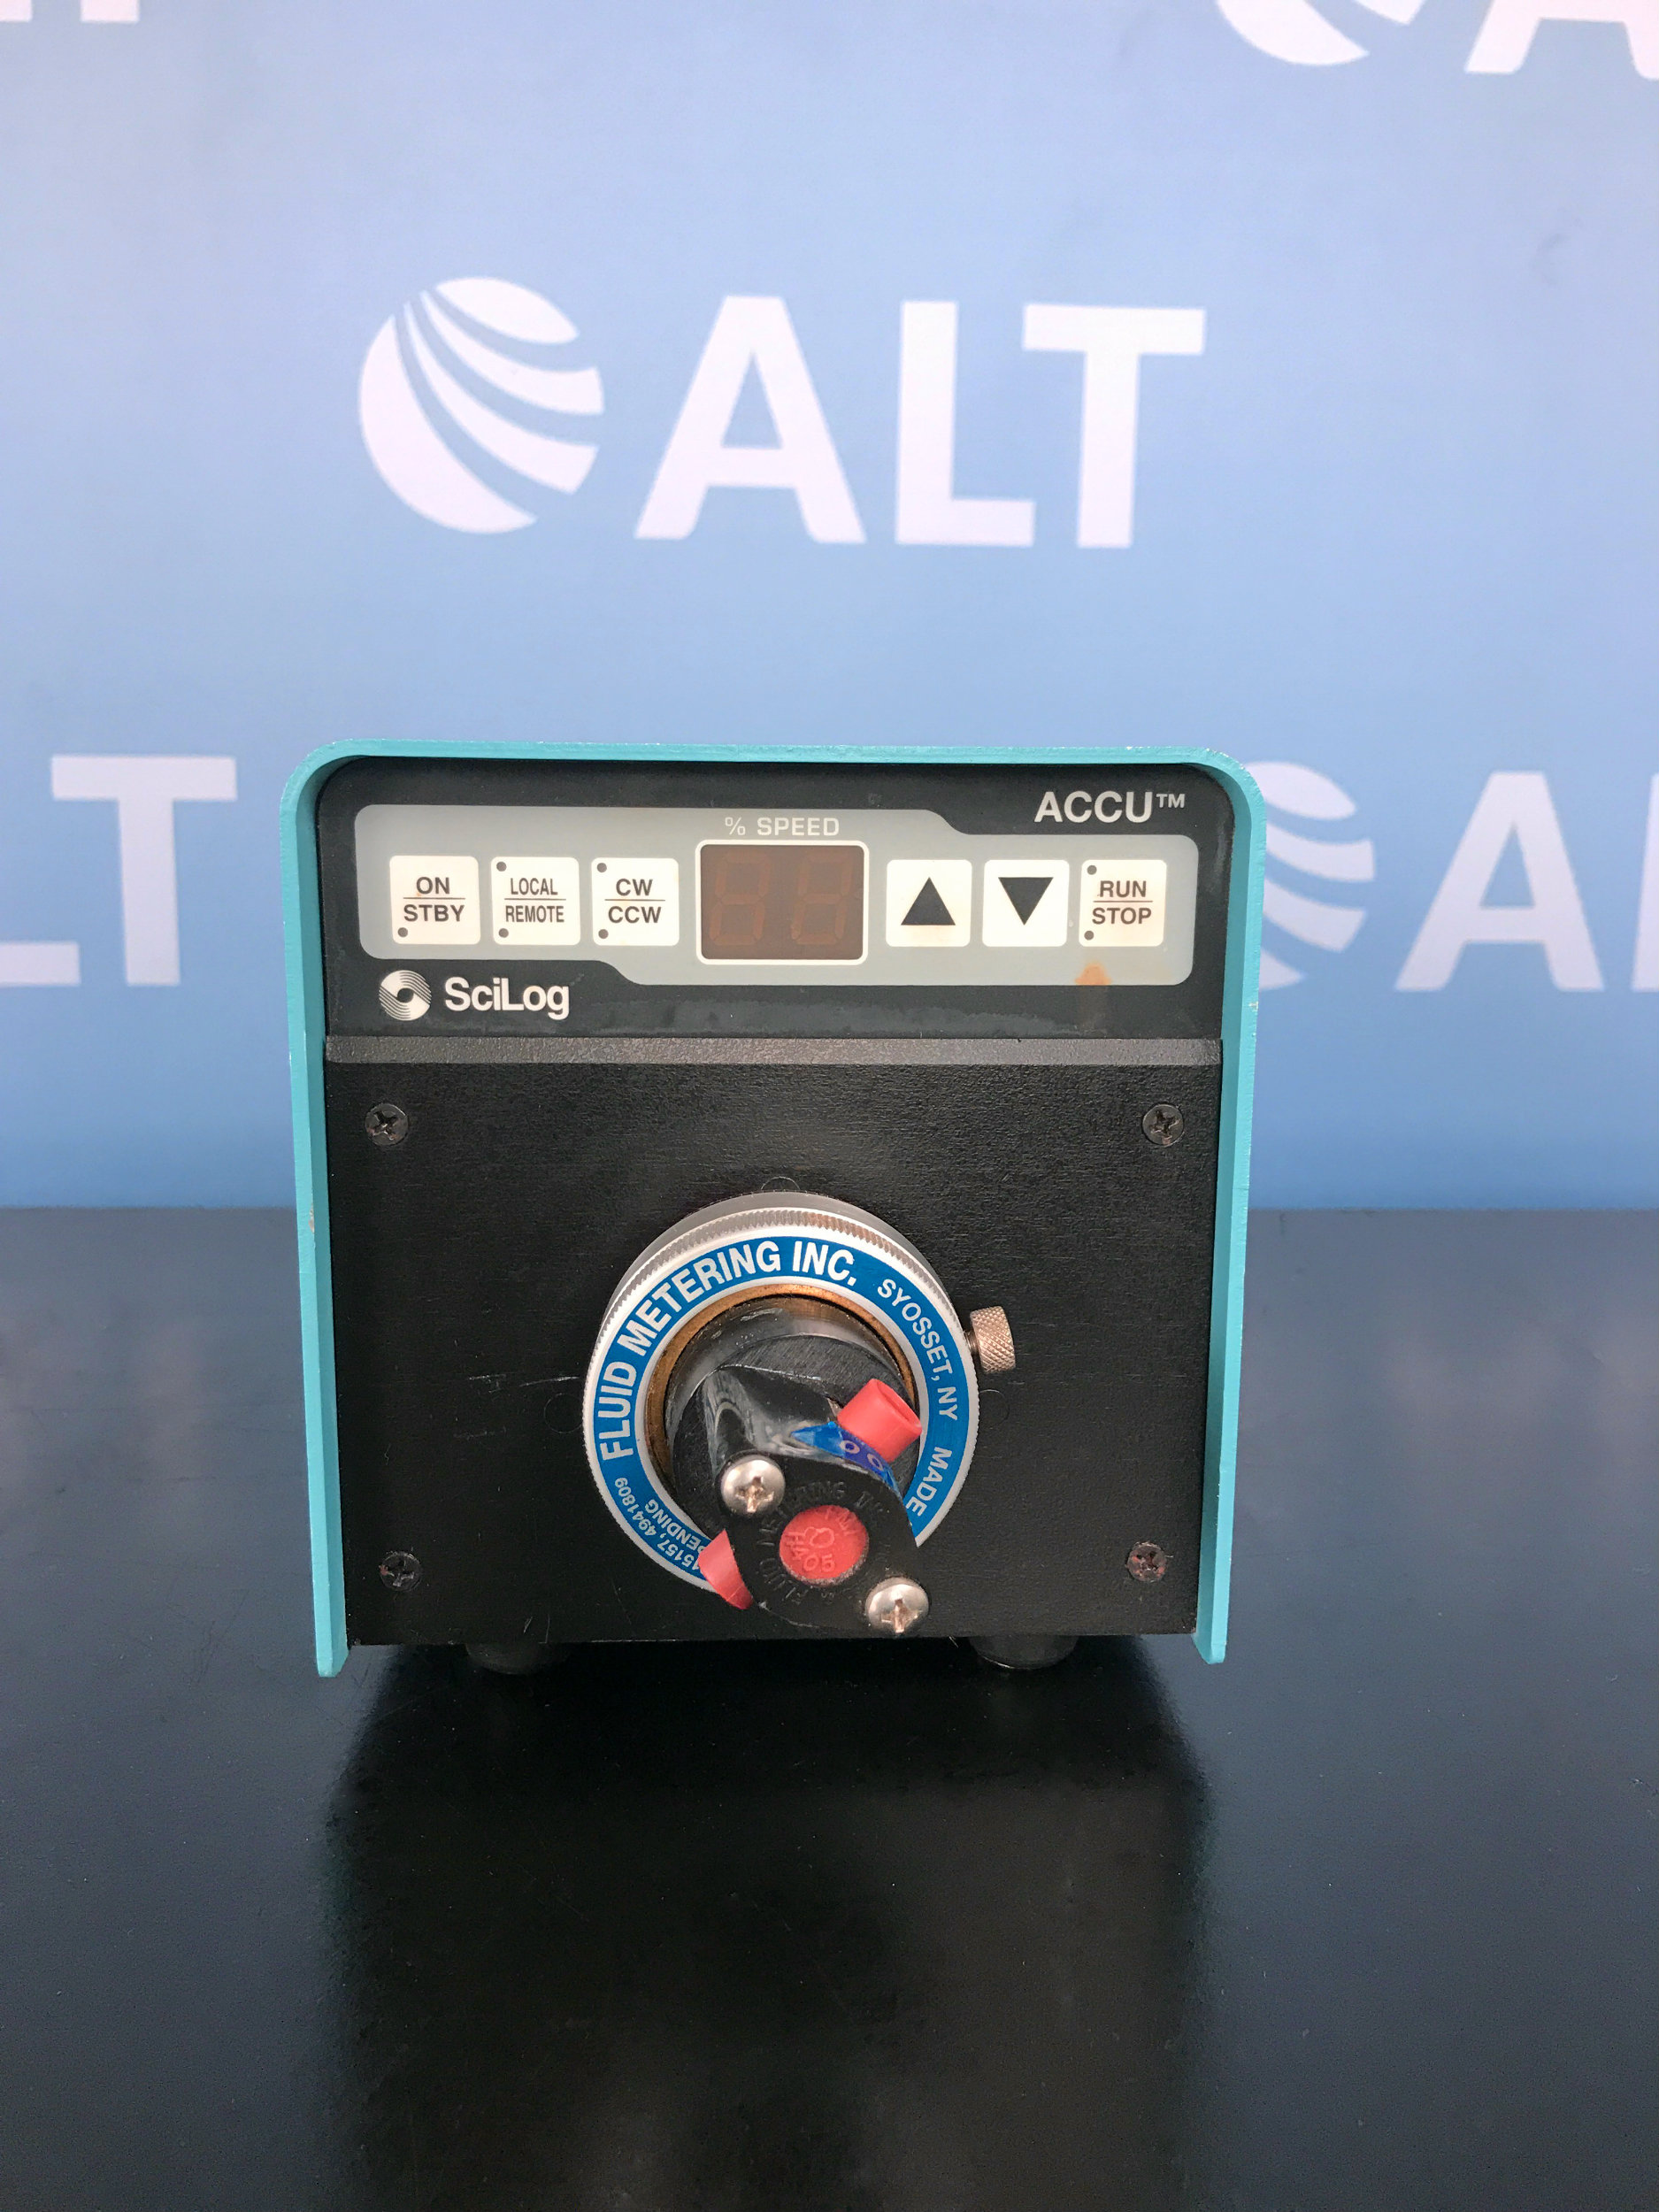 SciLog ACCU Digital Pump System Image